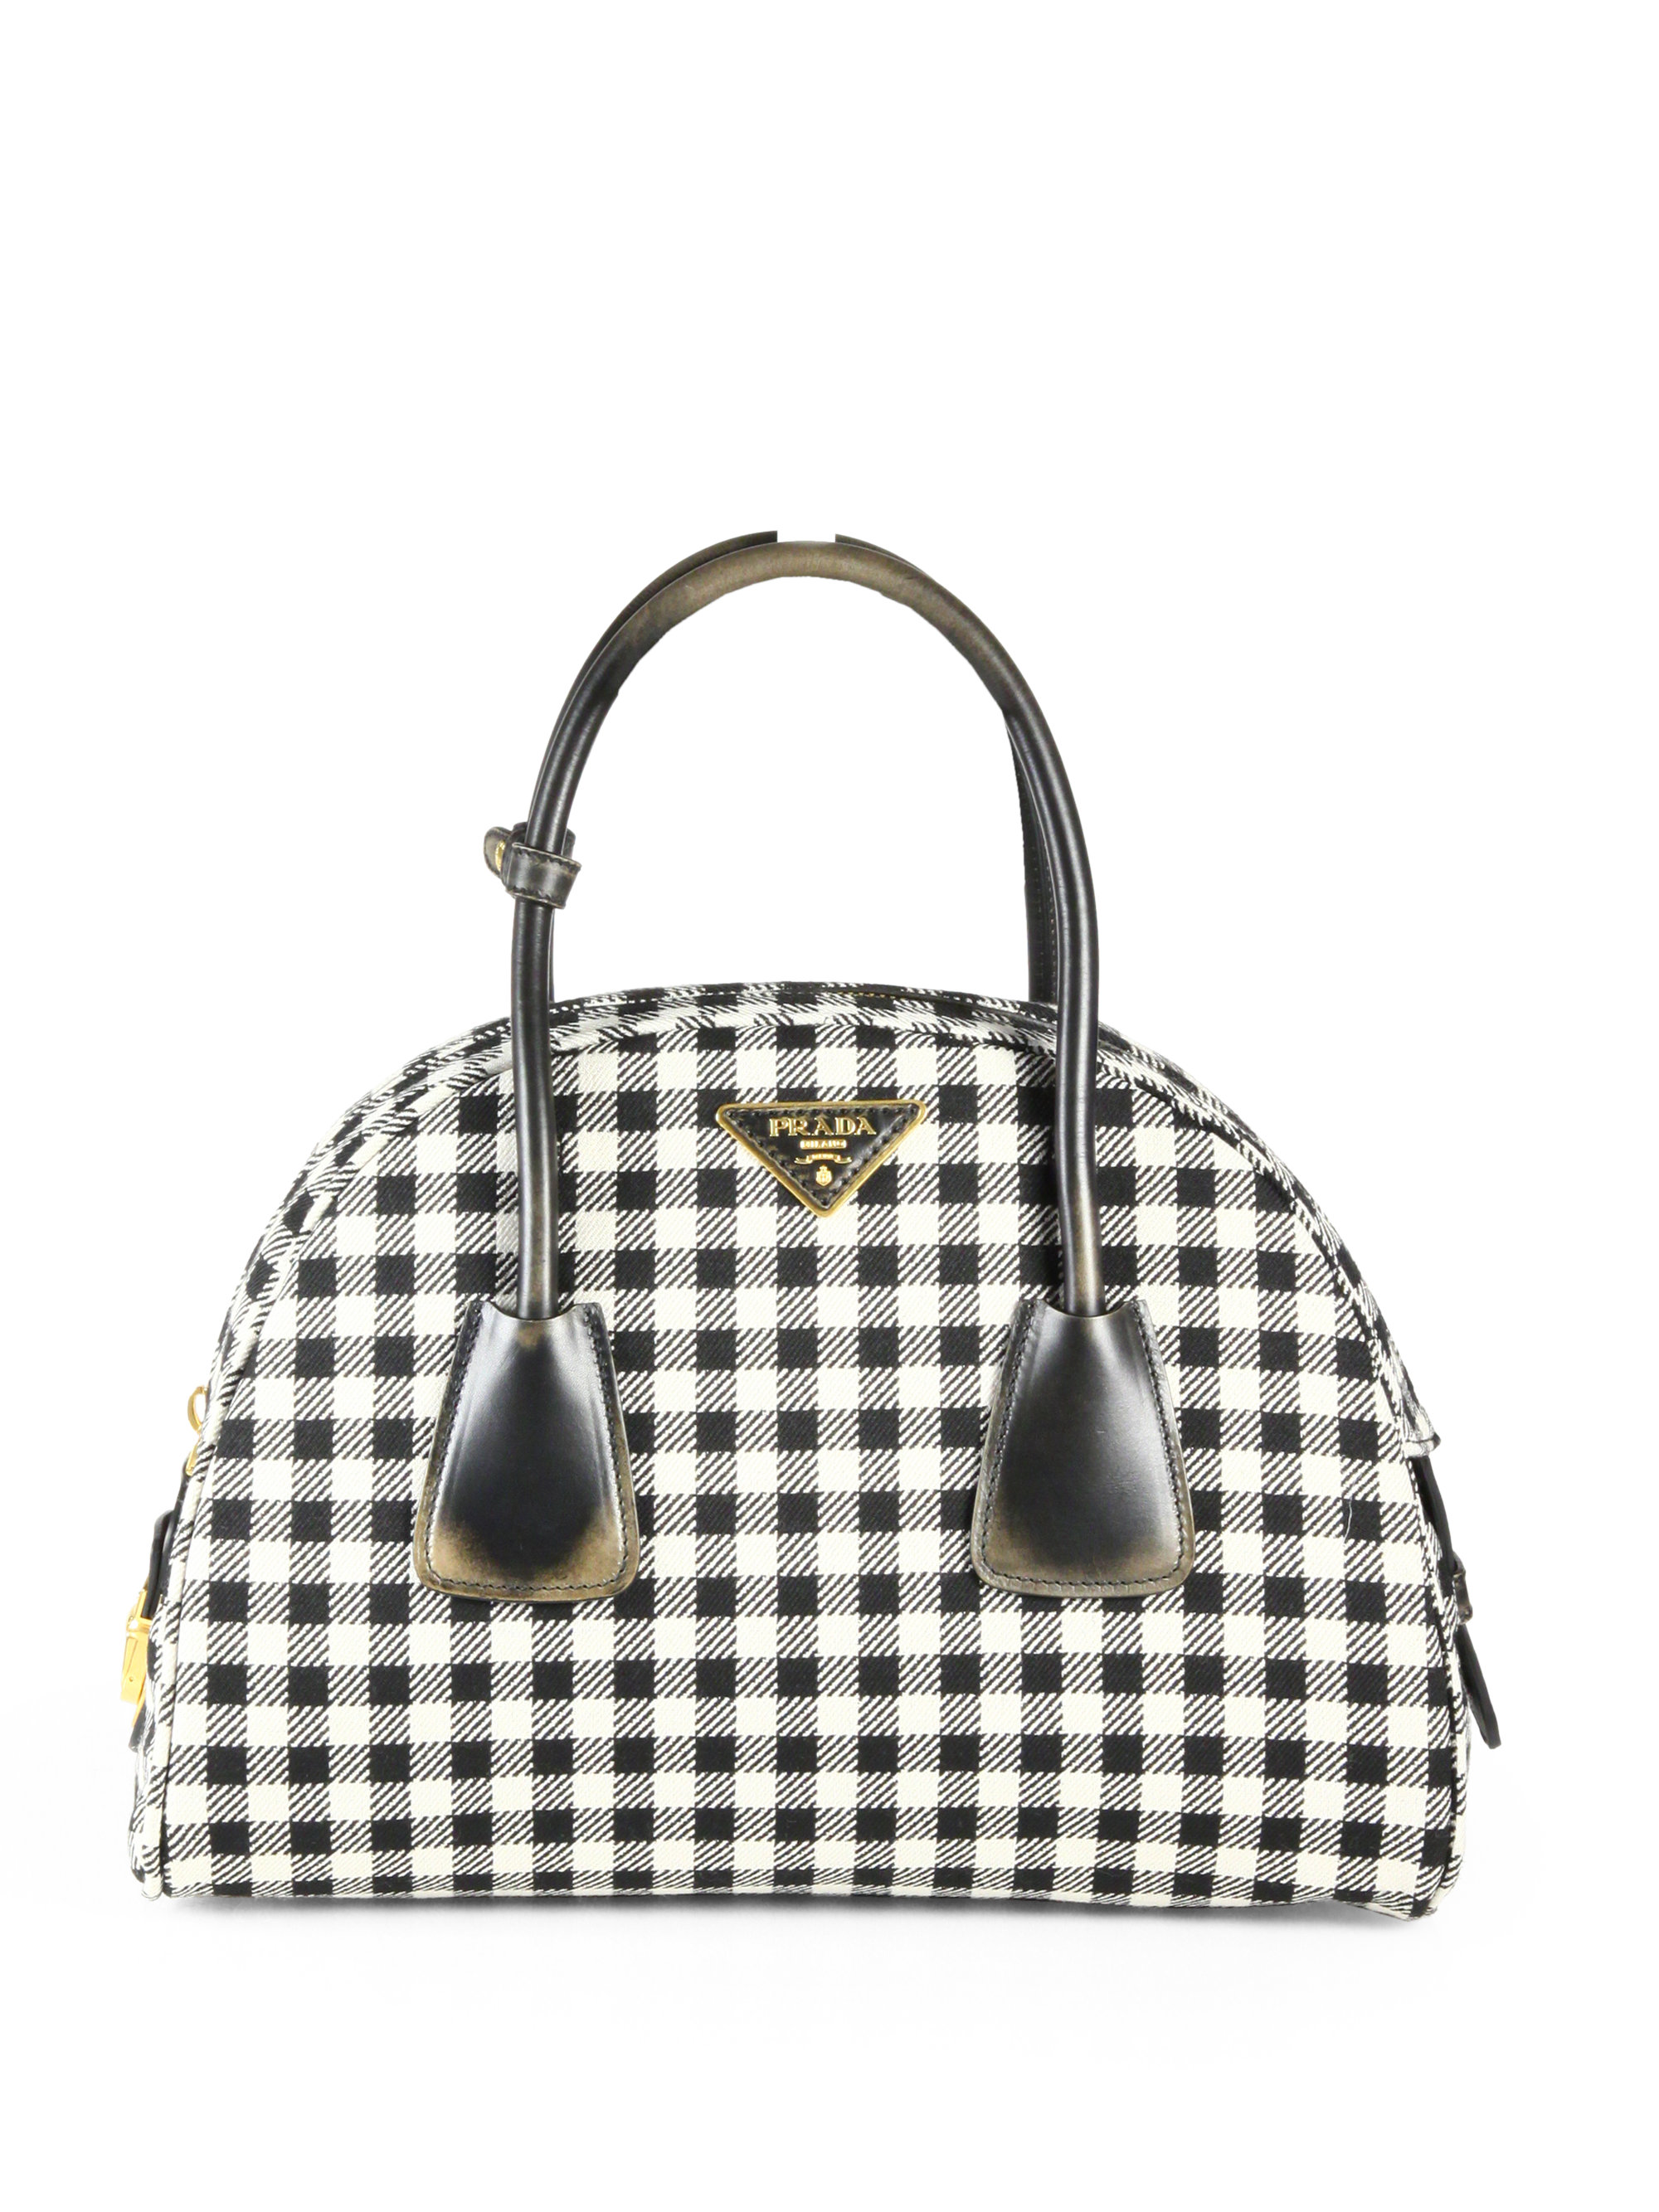 Lyst Prada Jacquard Check Small Bowler Bag In Black